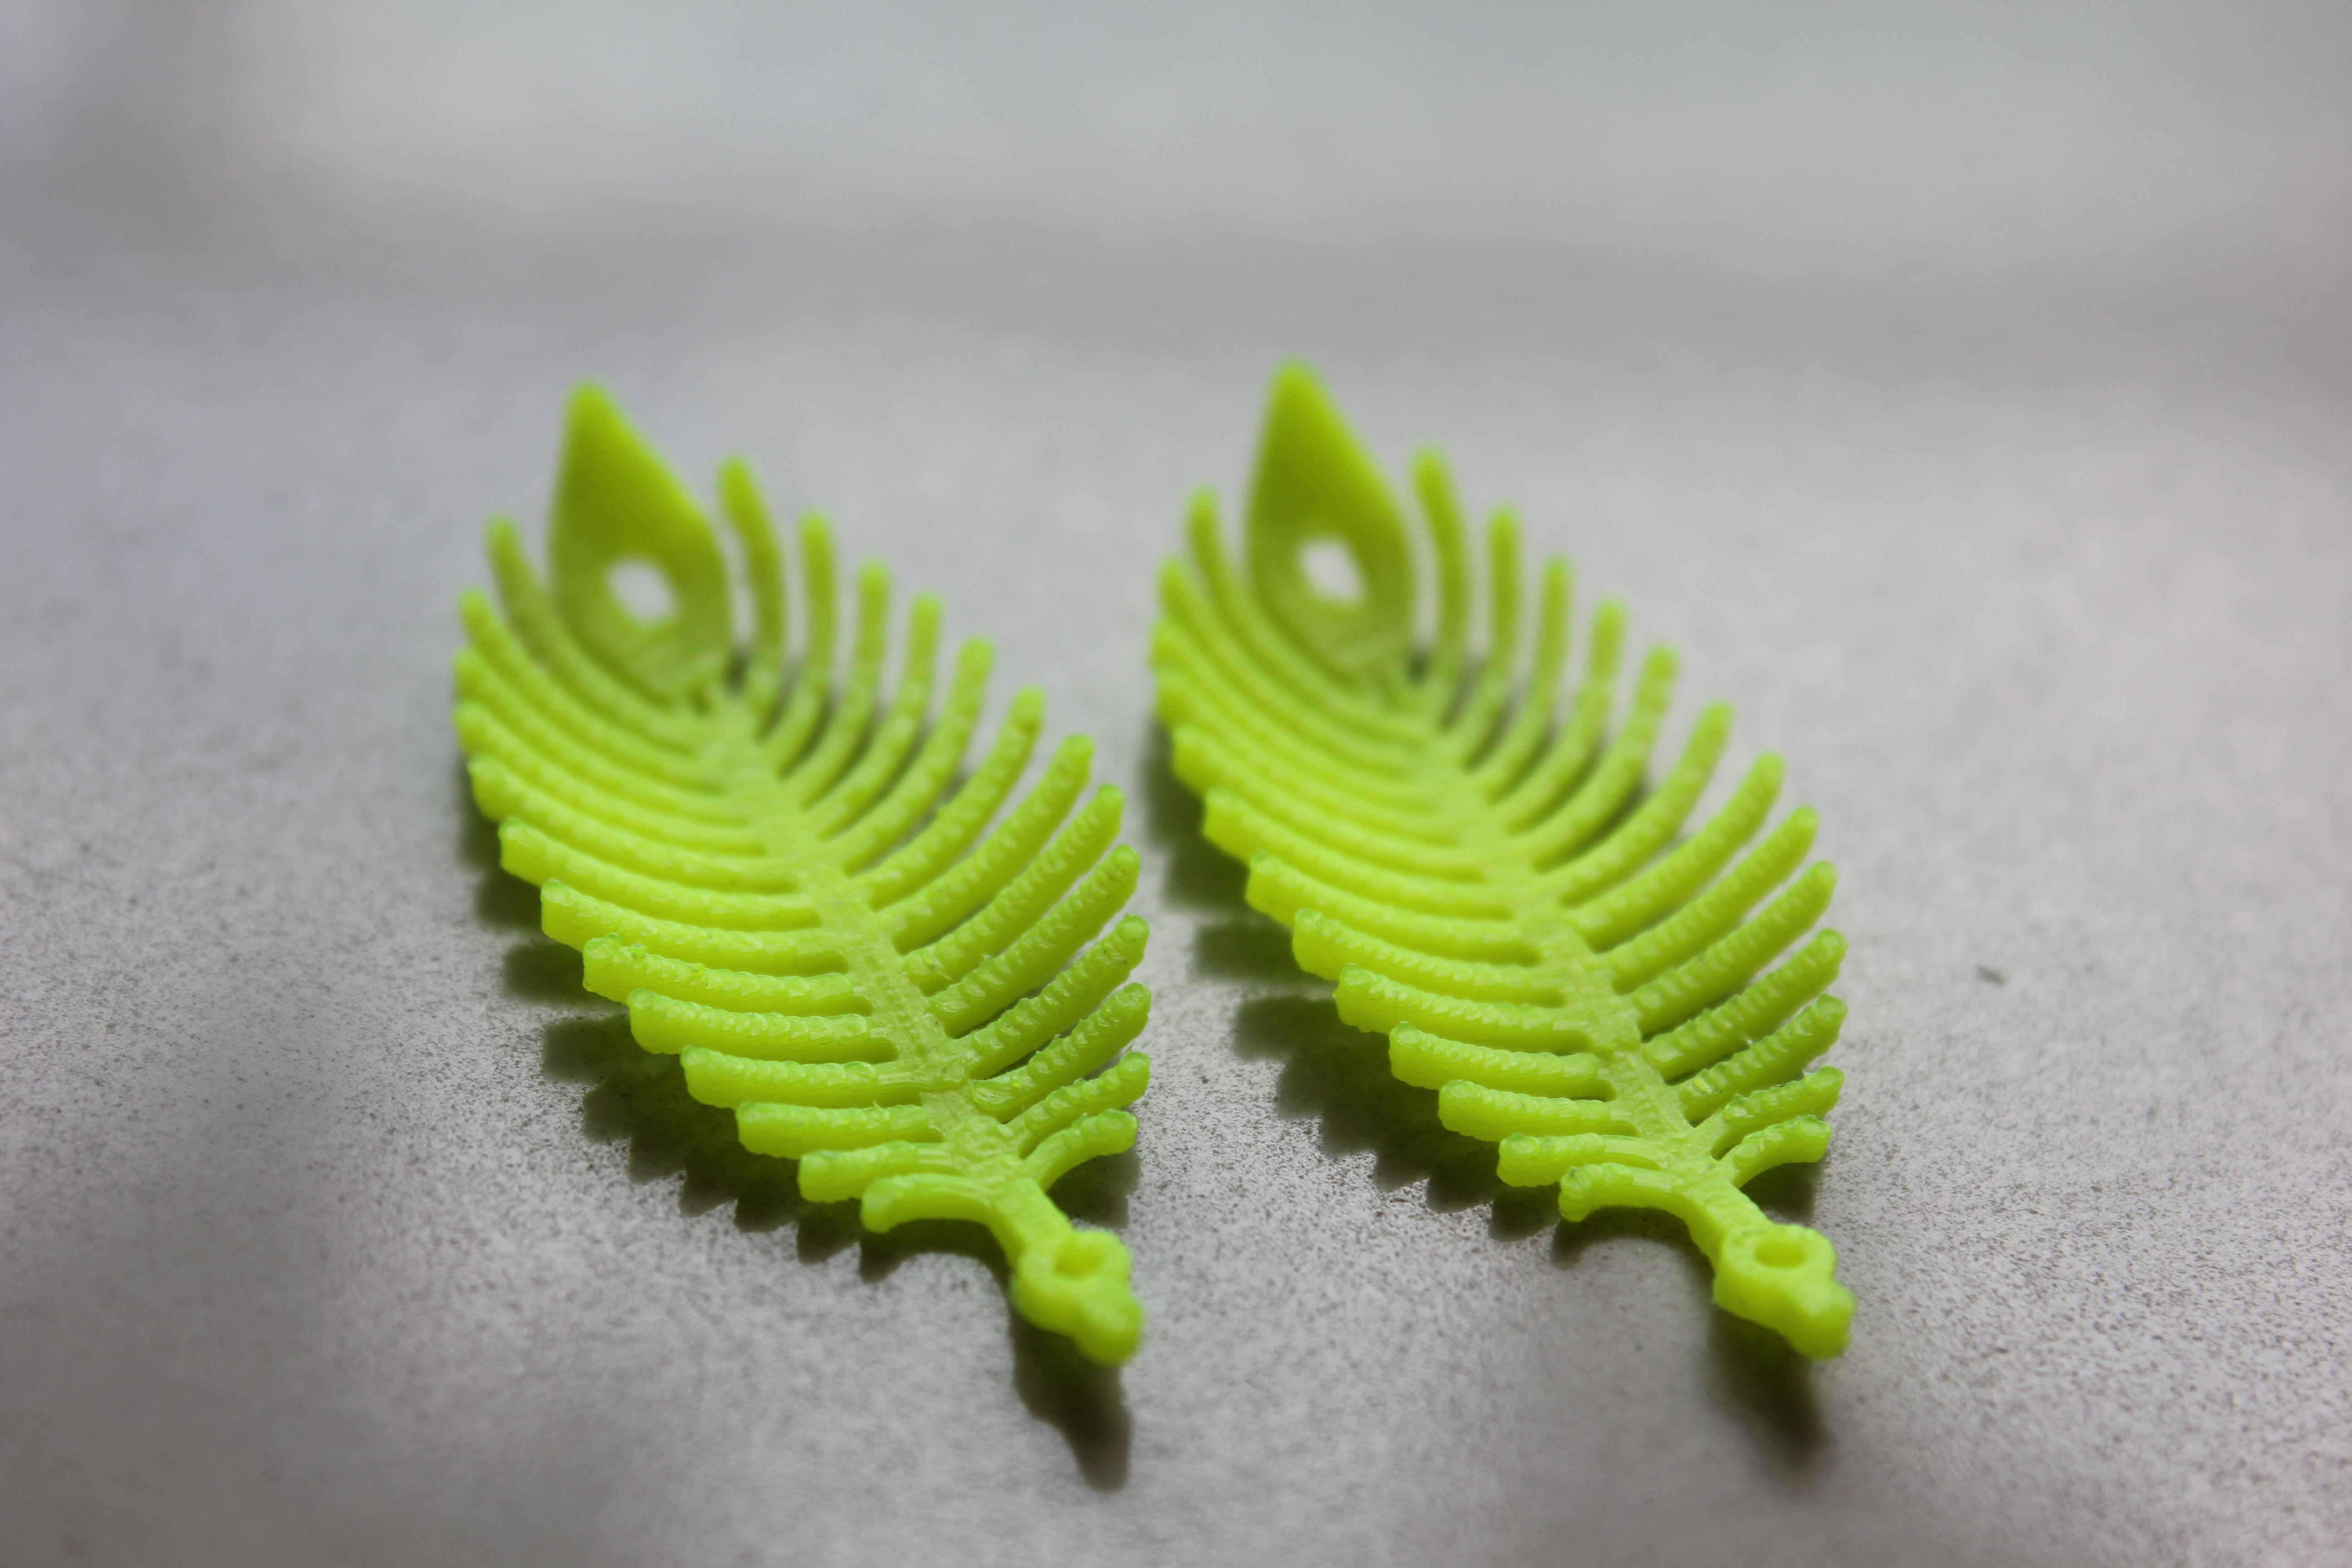 0001.jpg Download free STL file Earing -Leaf • 3D printer template, GeorgesNikkei